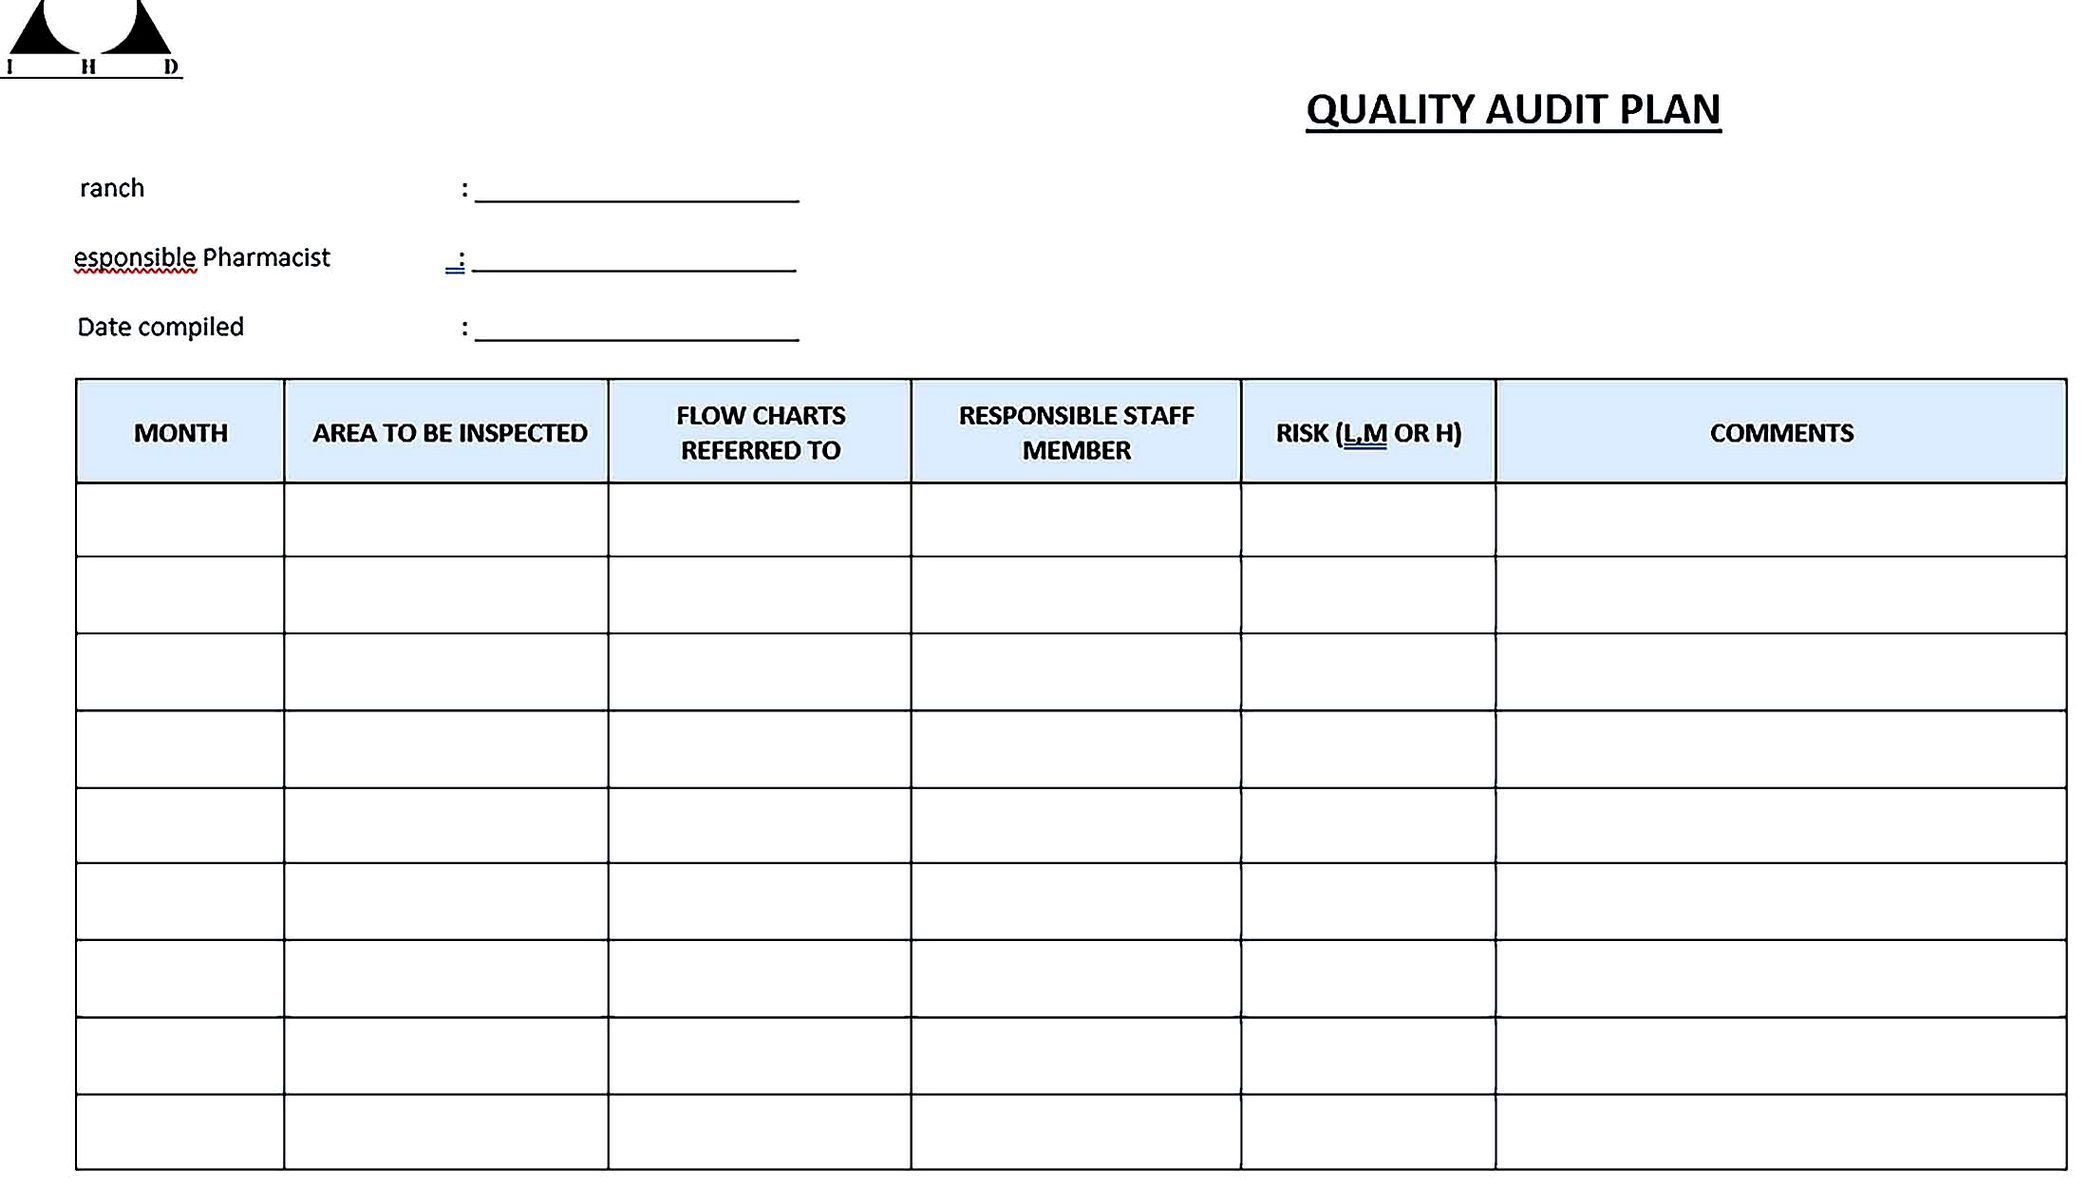 Quality Audit Plan